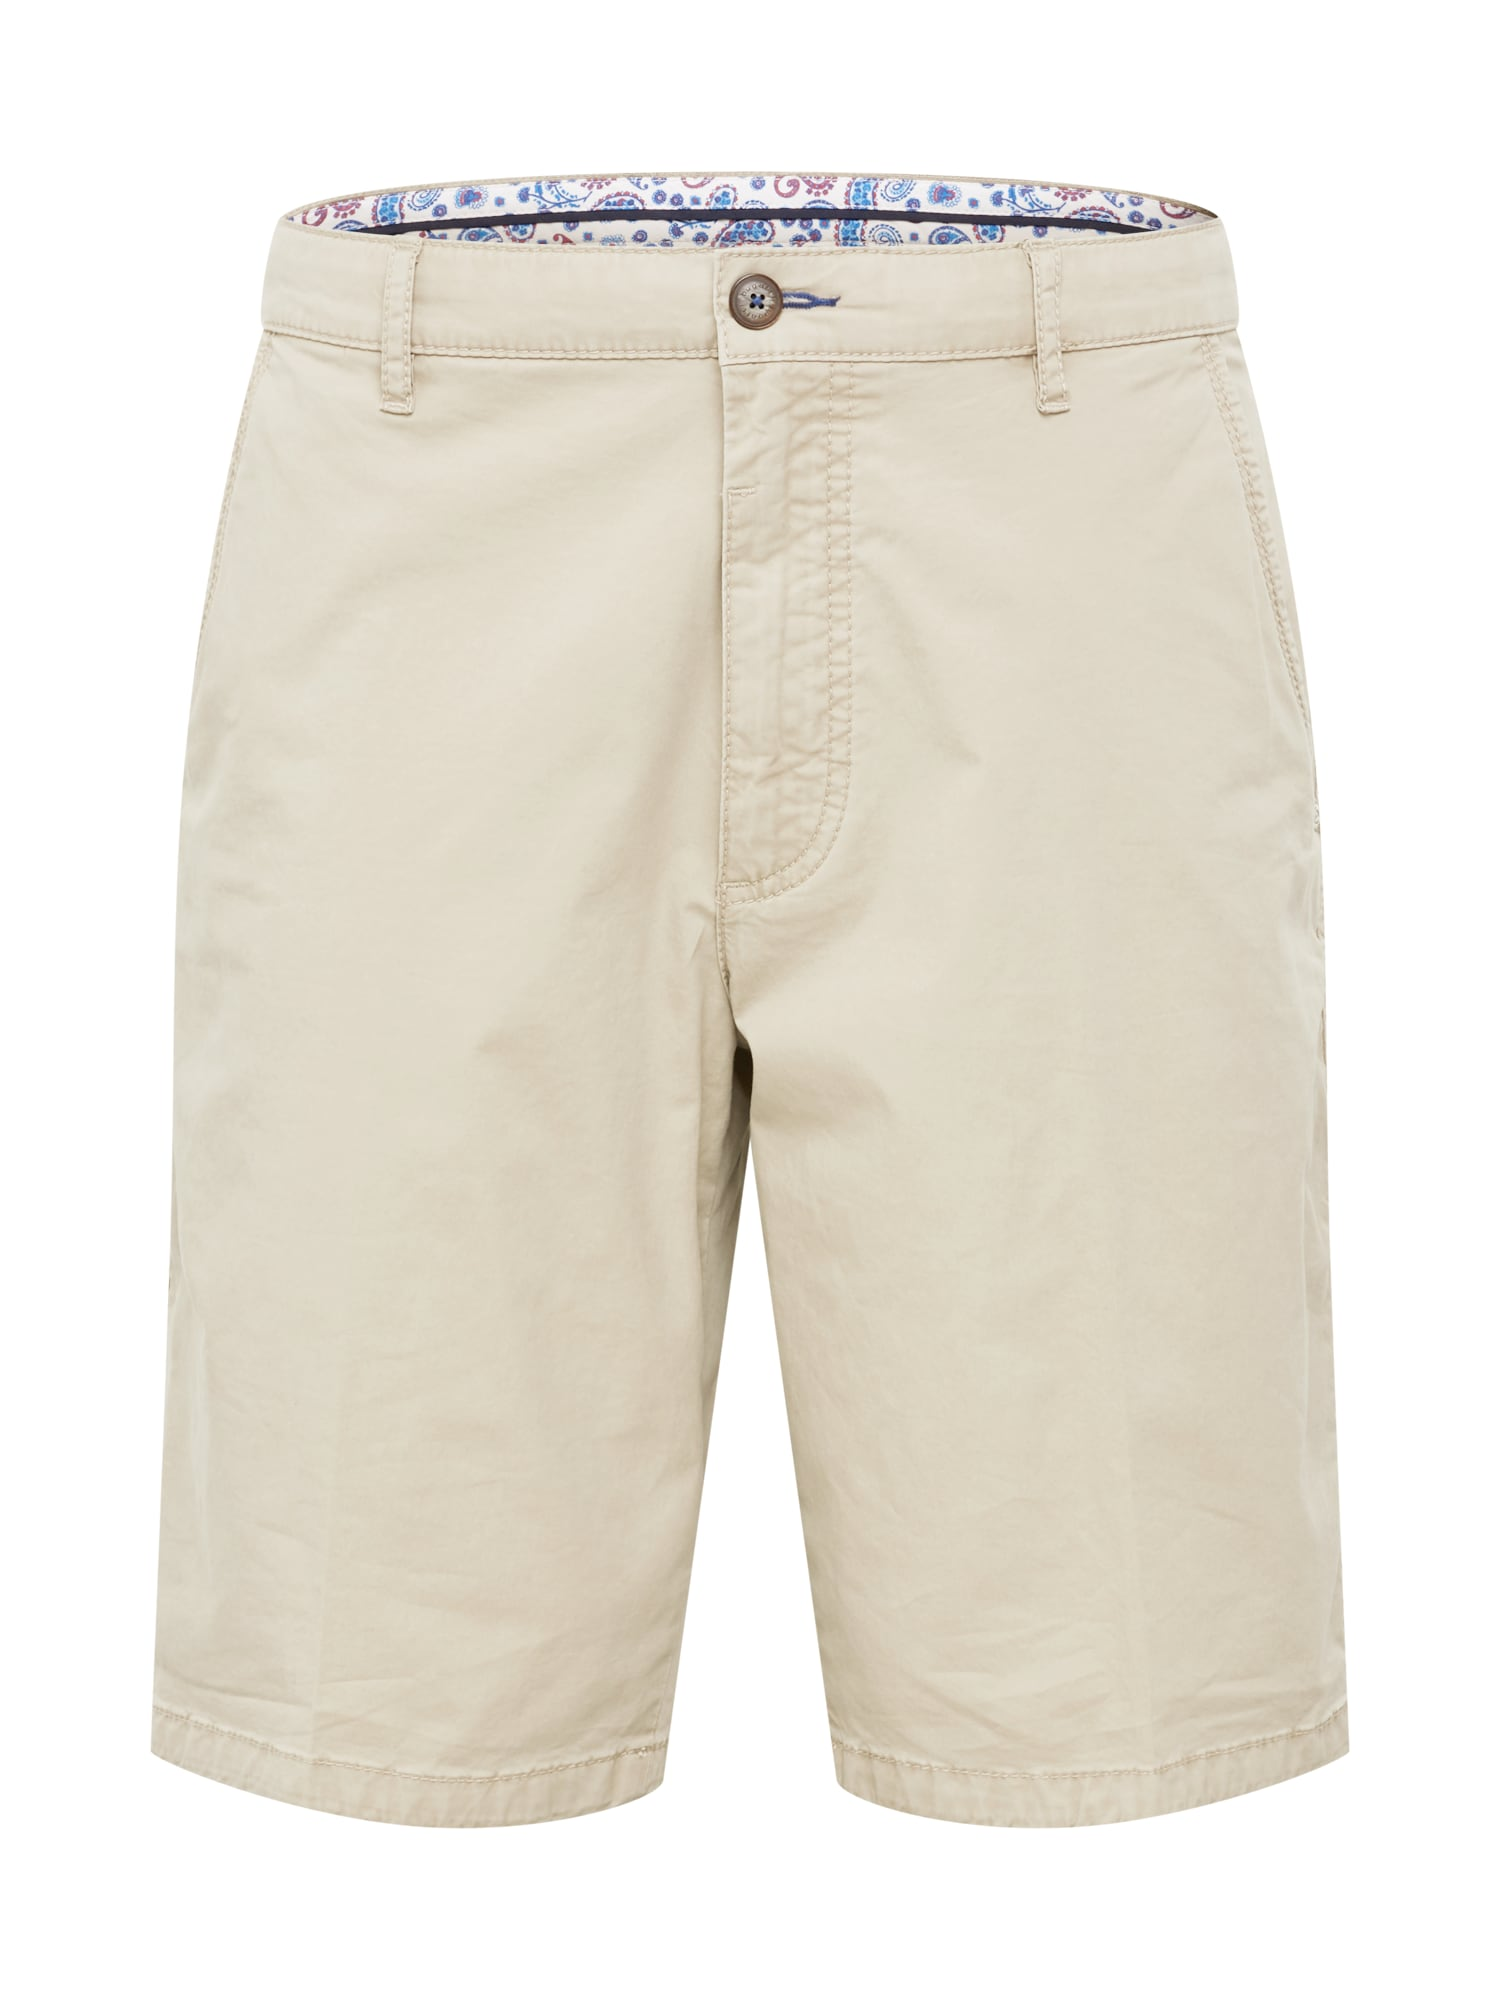 bugatti Chino stiliaus kelnės '4869' gelsvai pilka spalva